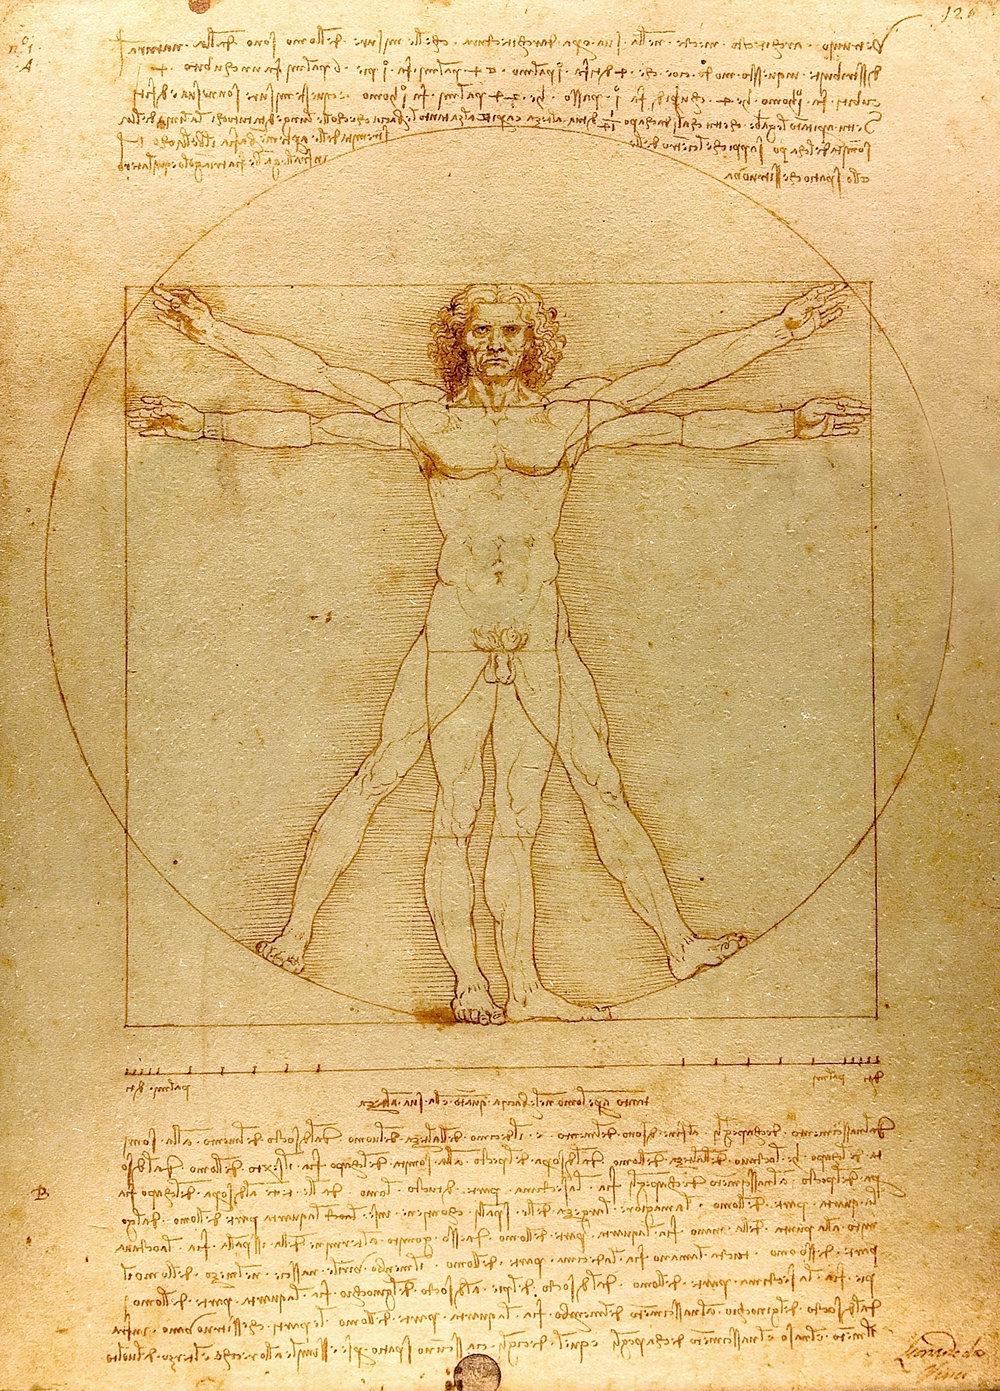 Figure 1.  Leonardo da Vinci,  The Vitruvian Man  (1490).